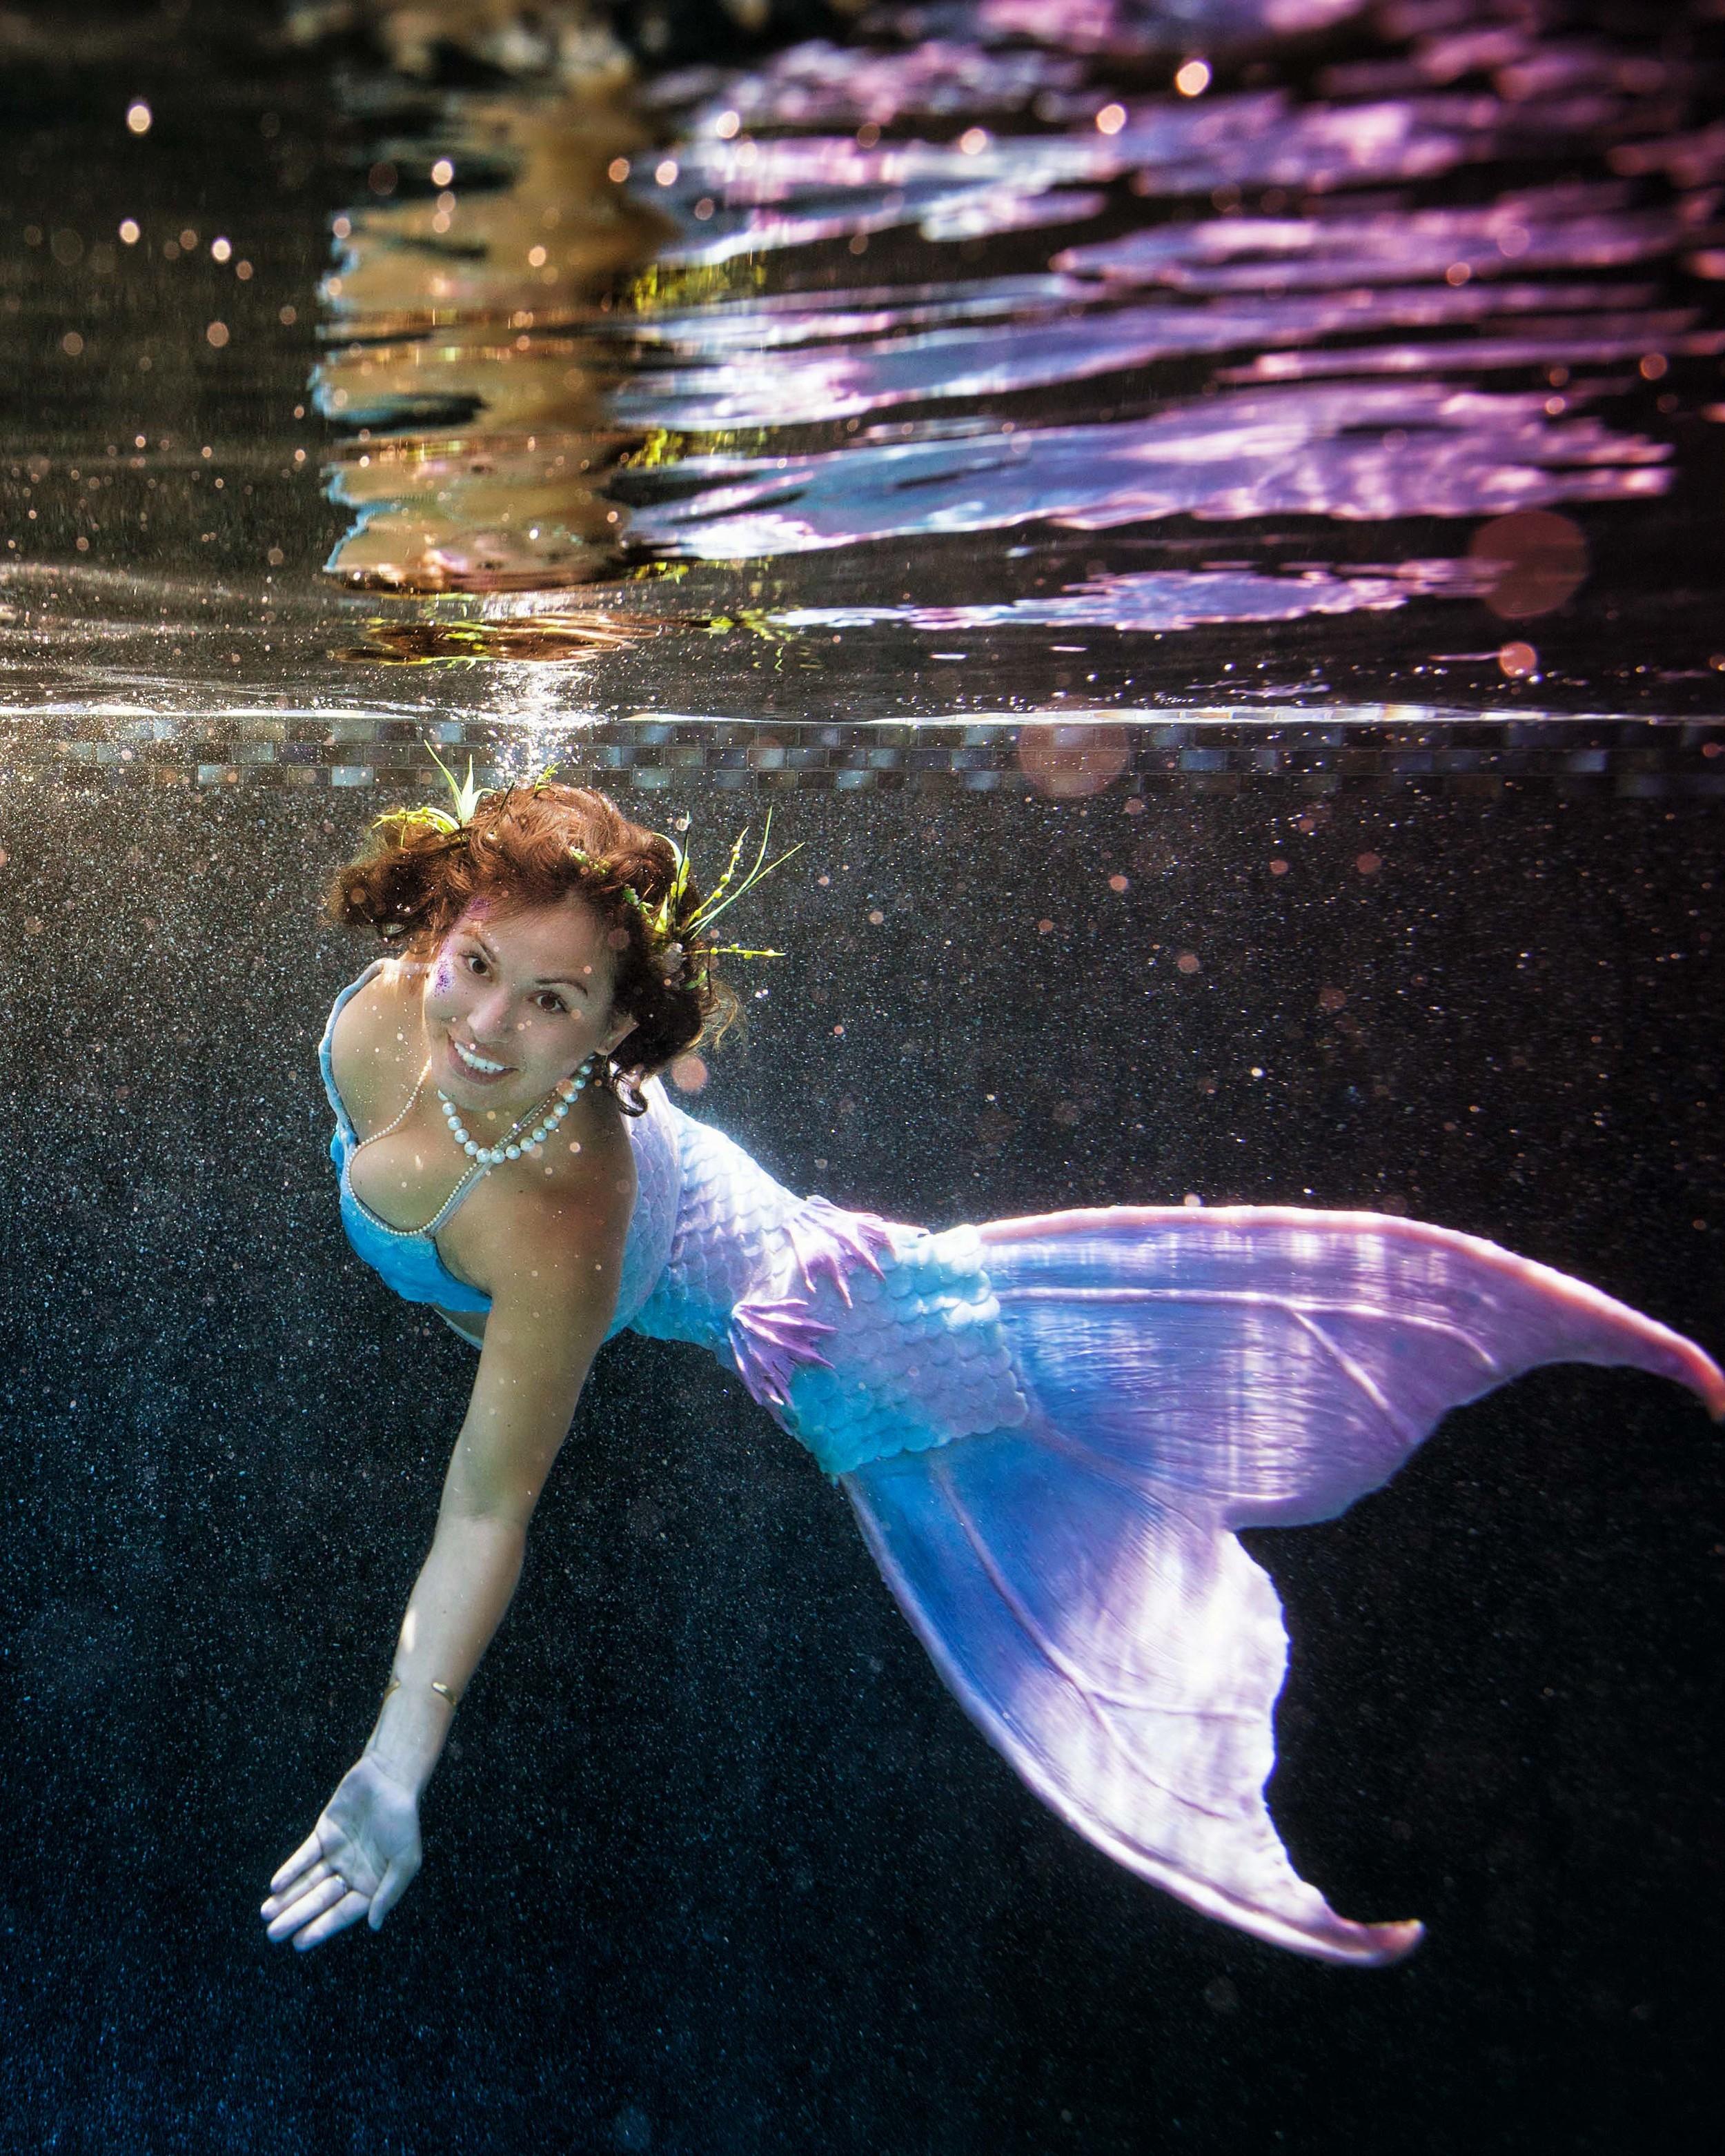 Mermaid Jessica web-1-(ZF-7422-64532-1-028).jpg